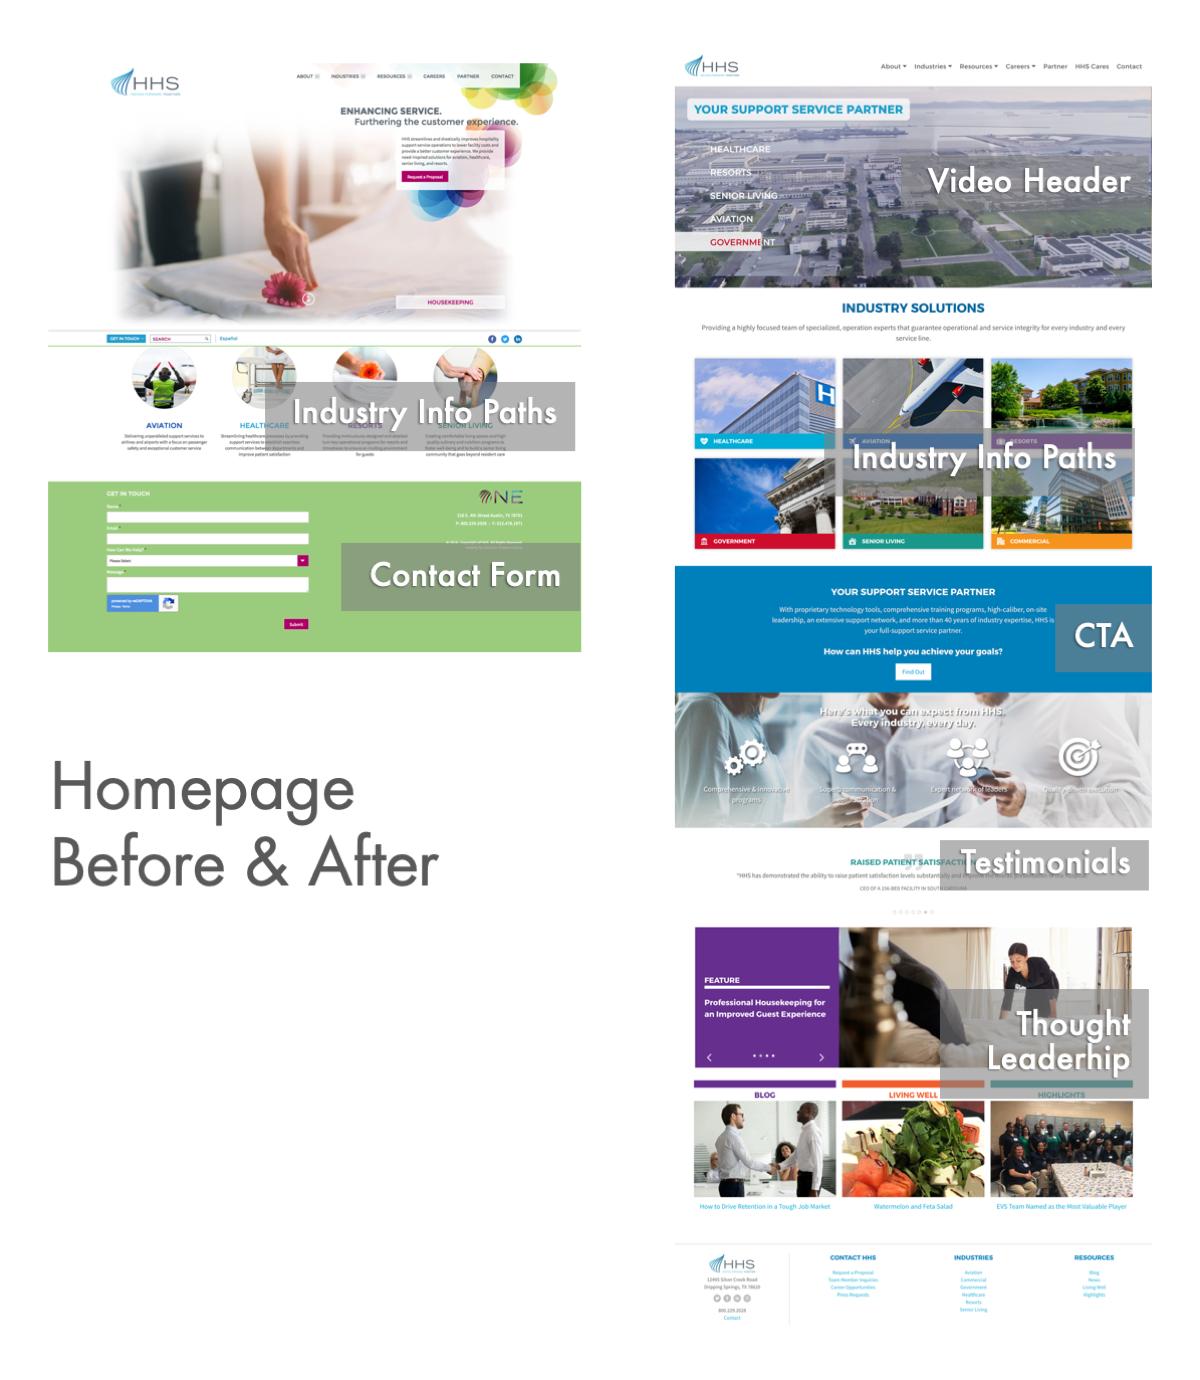 Old website homepage design versus new website homepage design